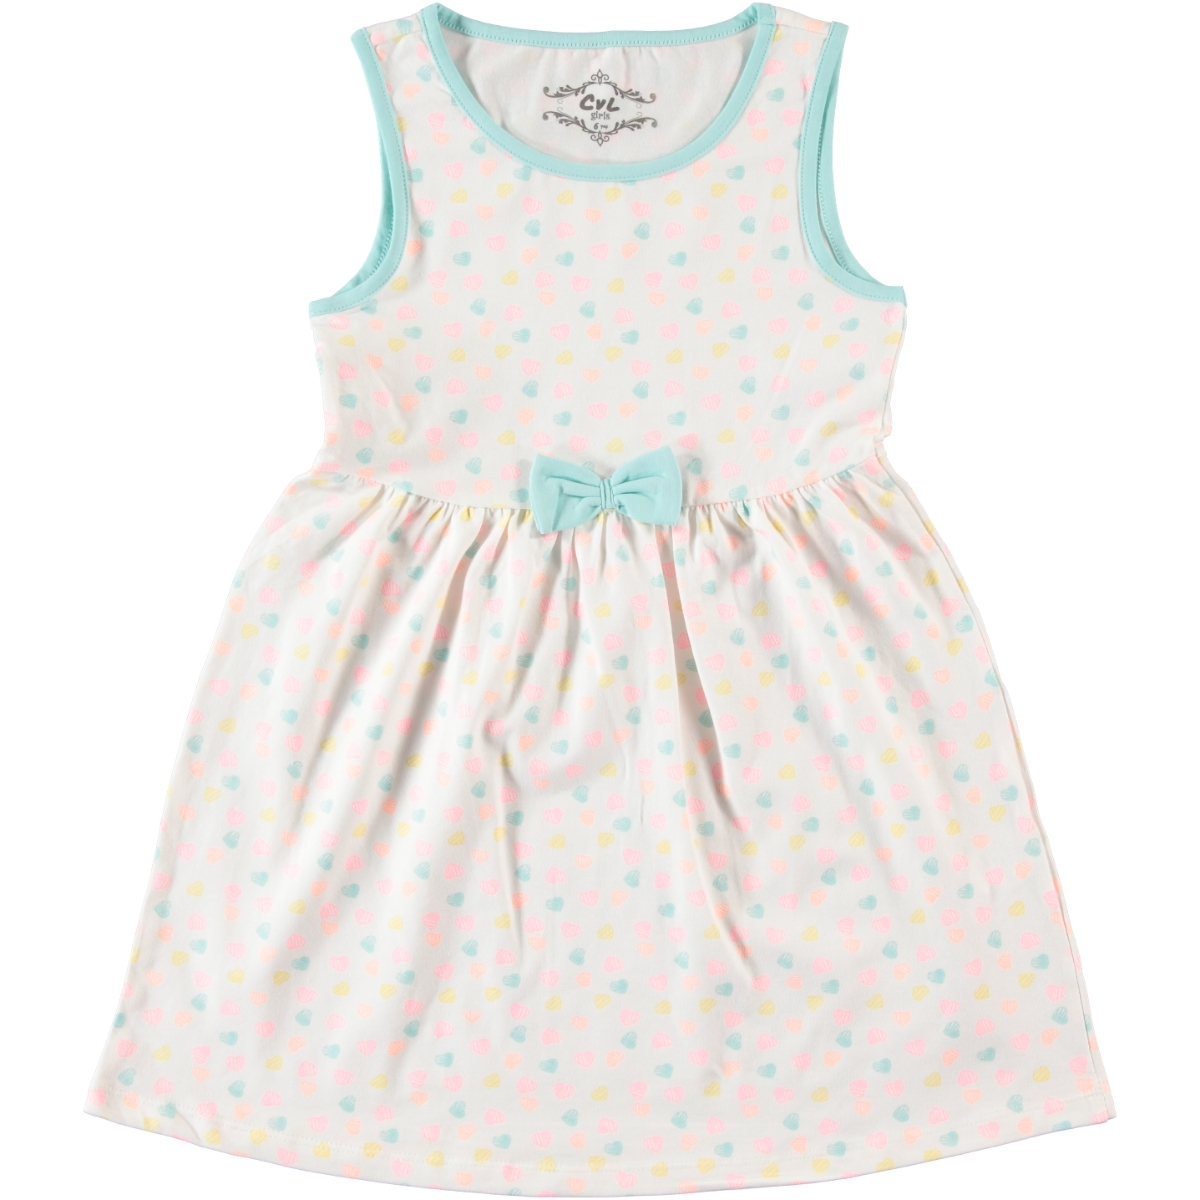 0b92afe60f90c 7612 / EKR Cvl Kız Çocuk Elbise 6-9 Yaş Ekru